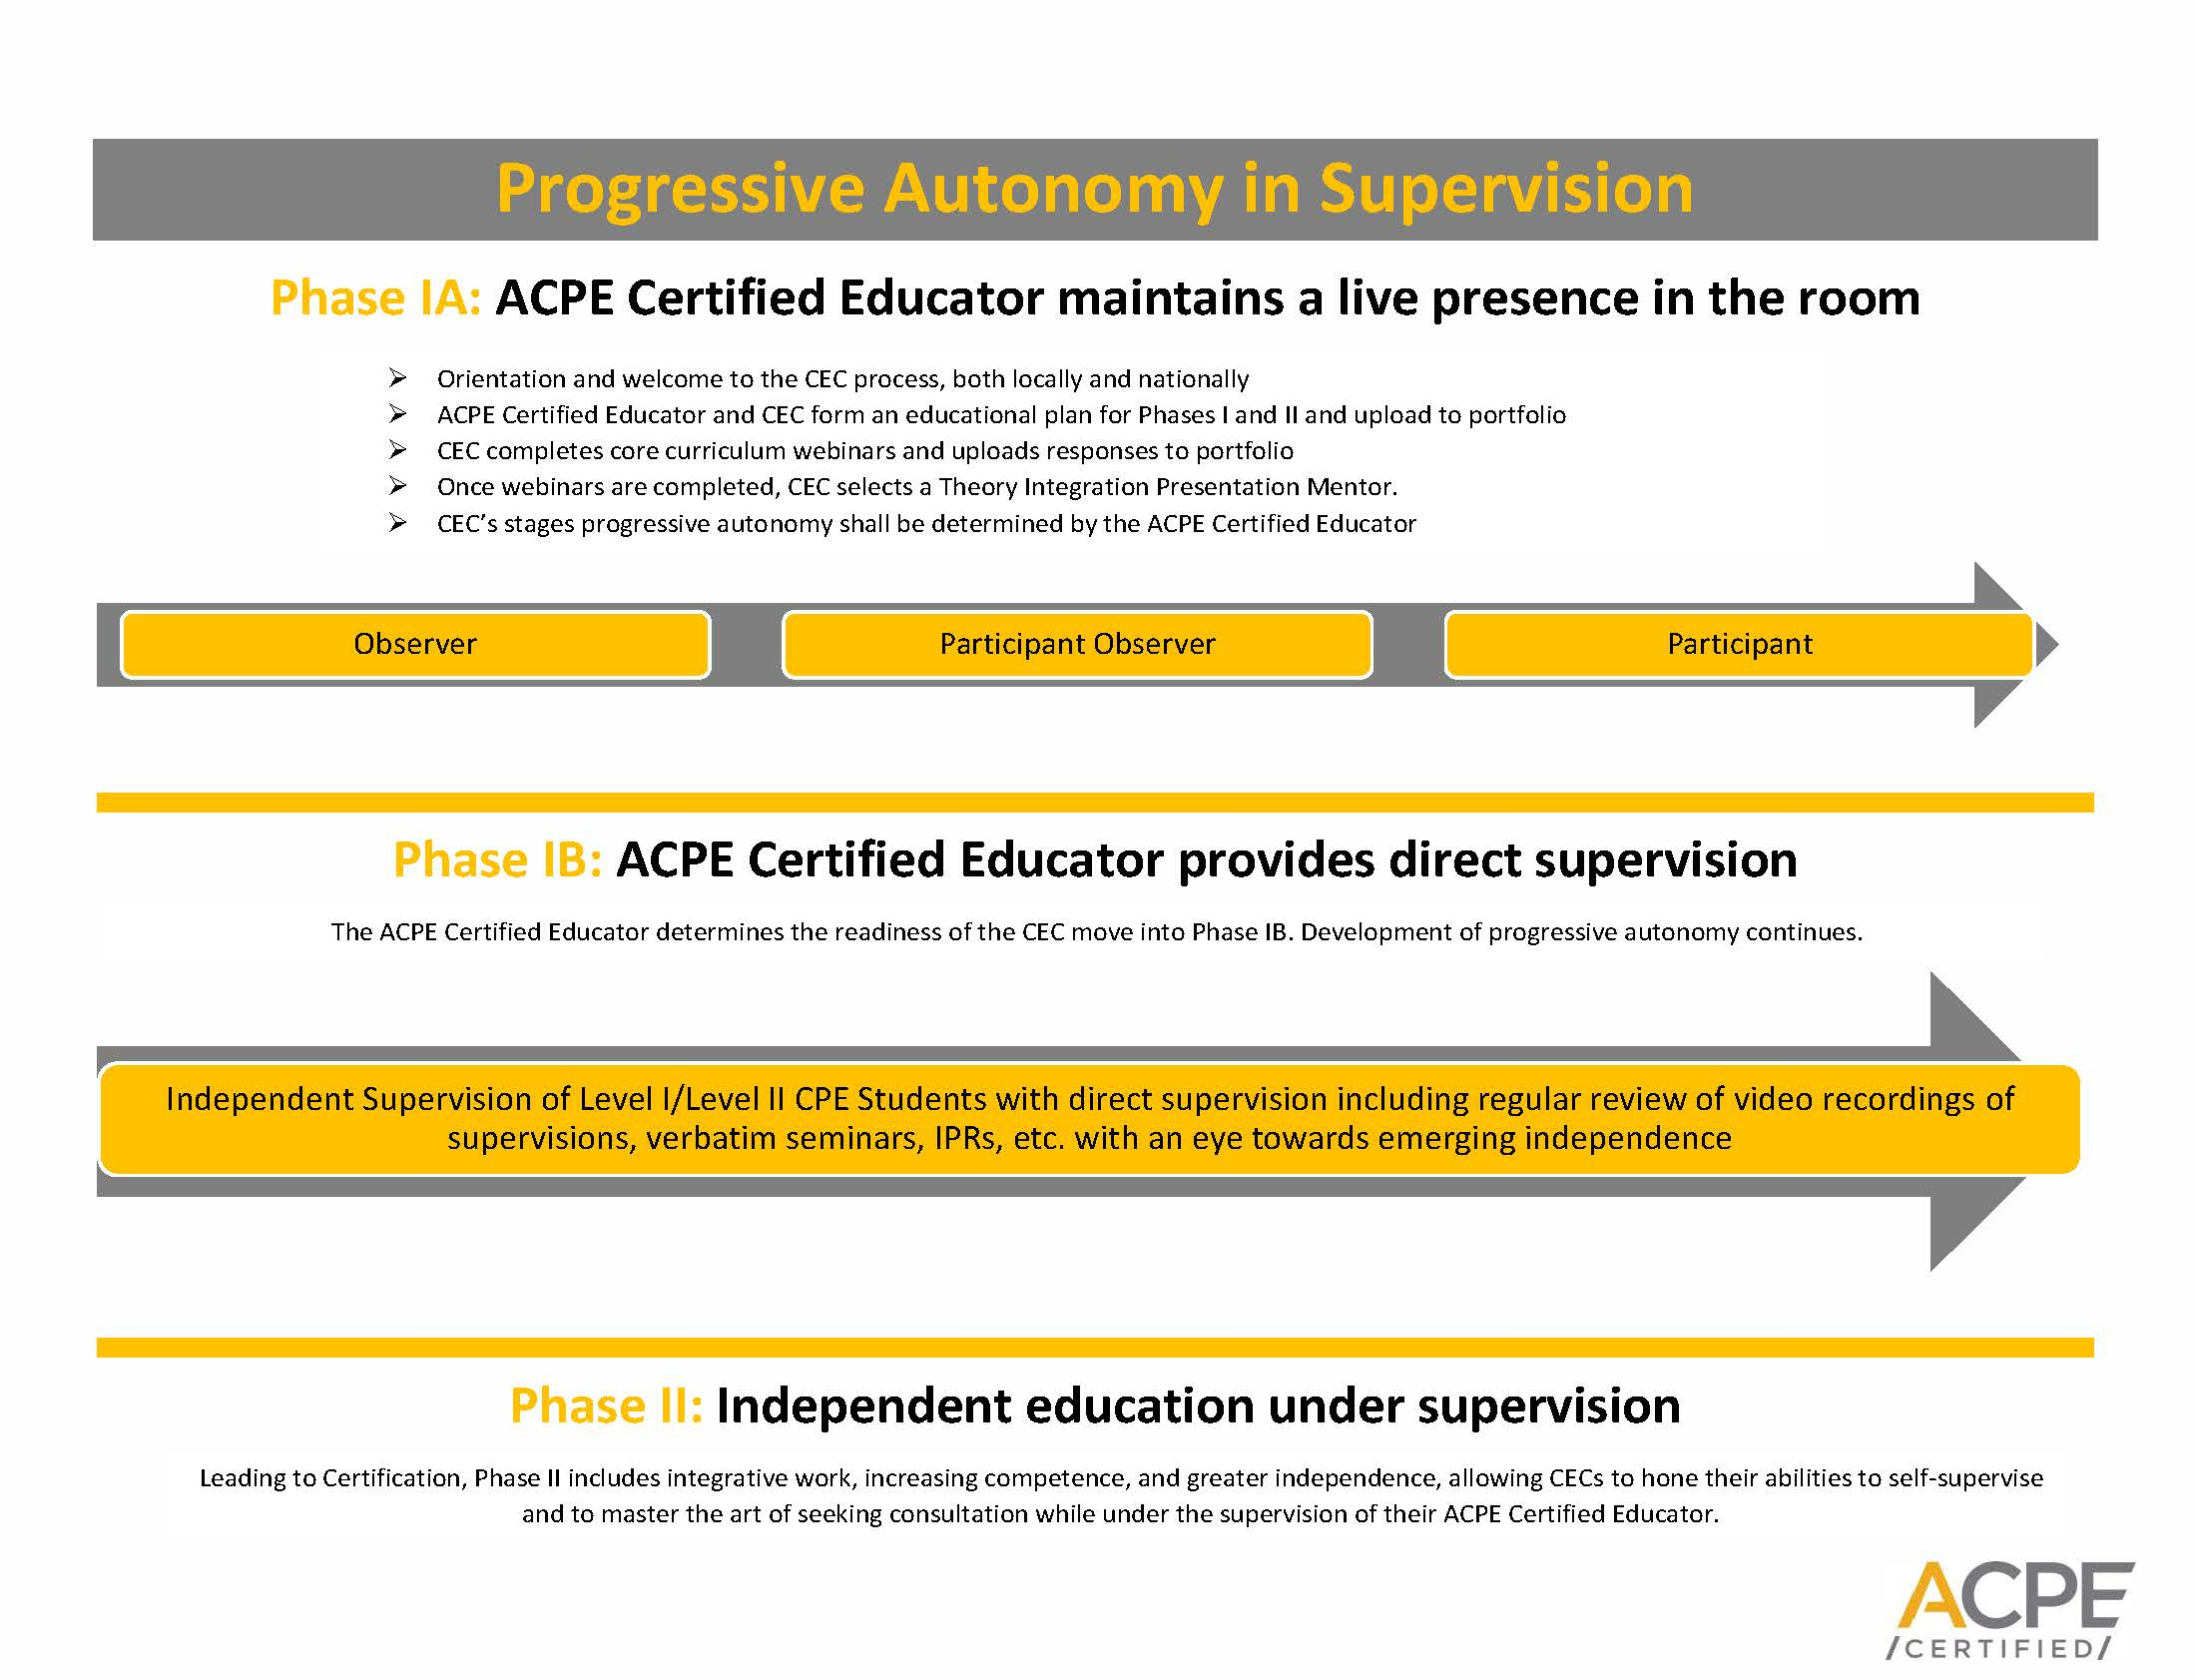 Progressive Autonomy In Educating Under Supervision Acpe Manuals